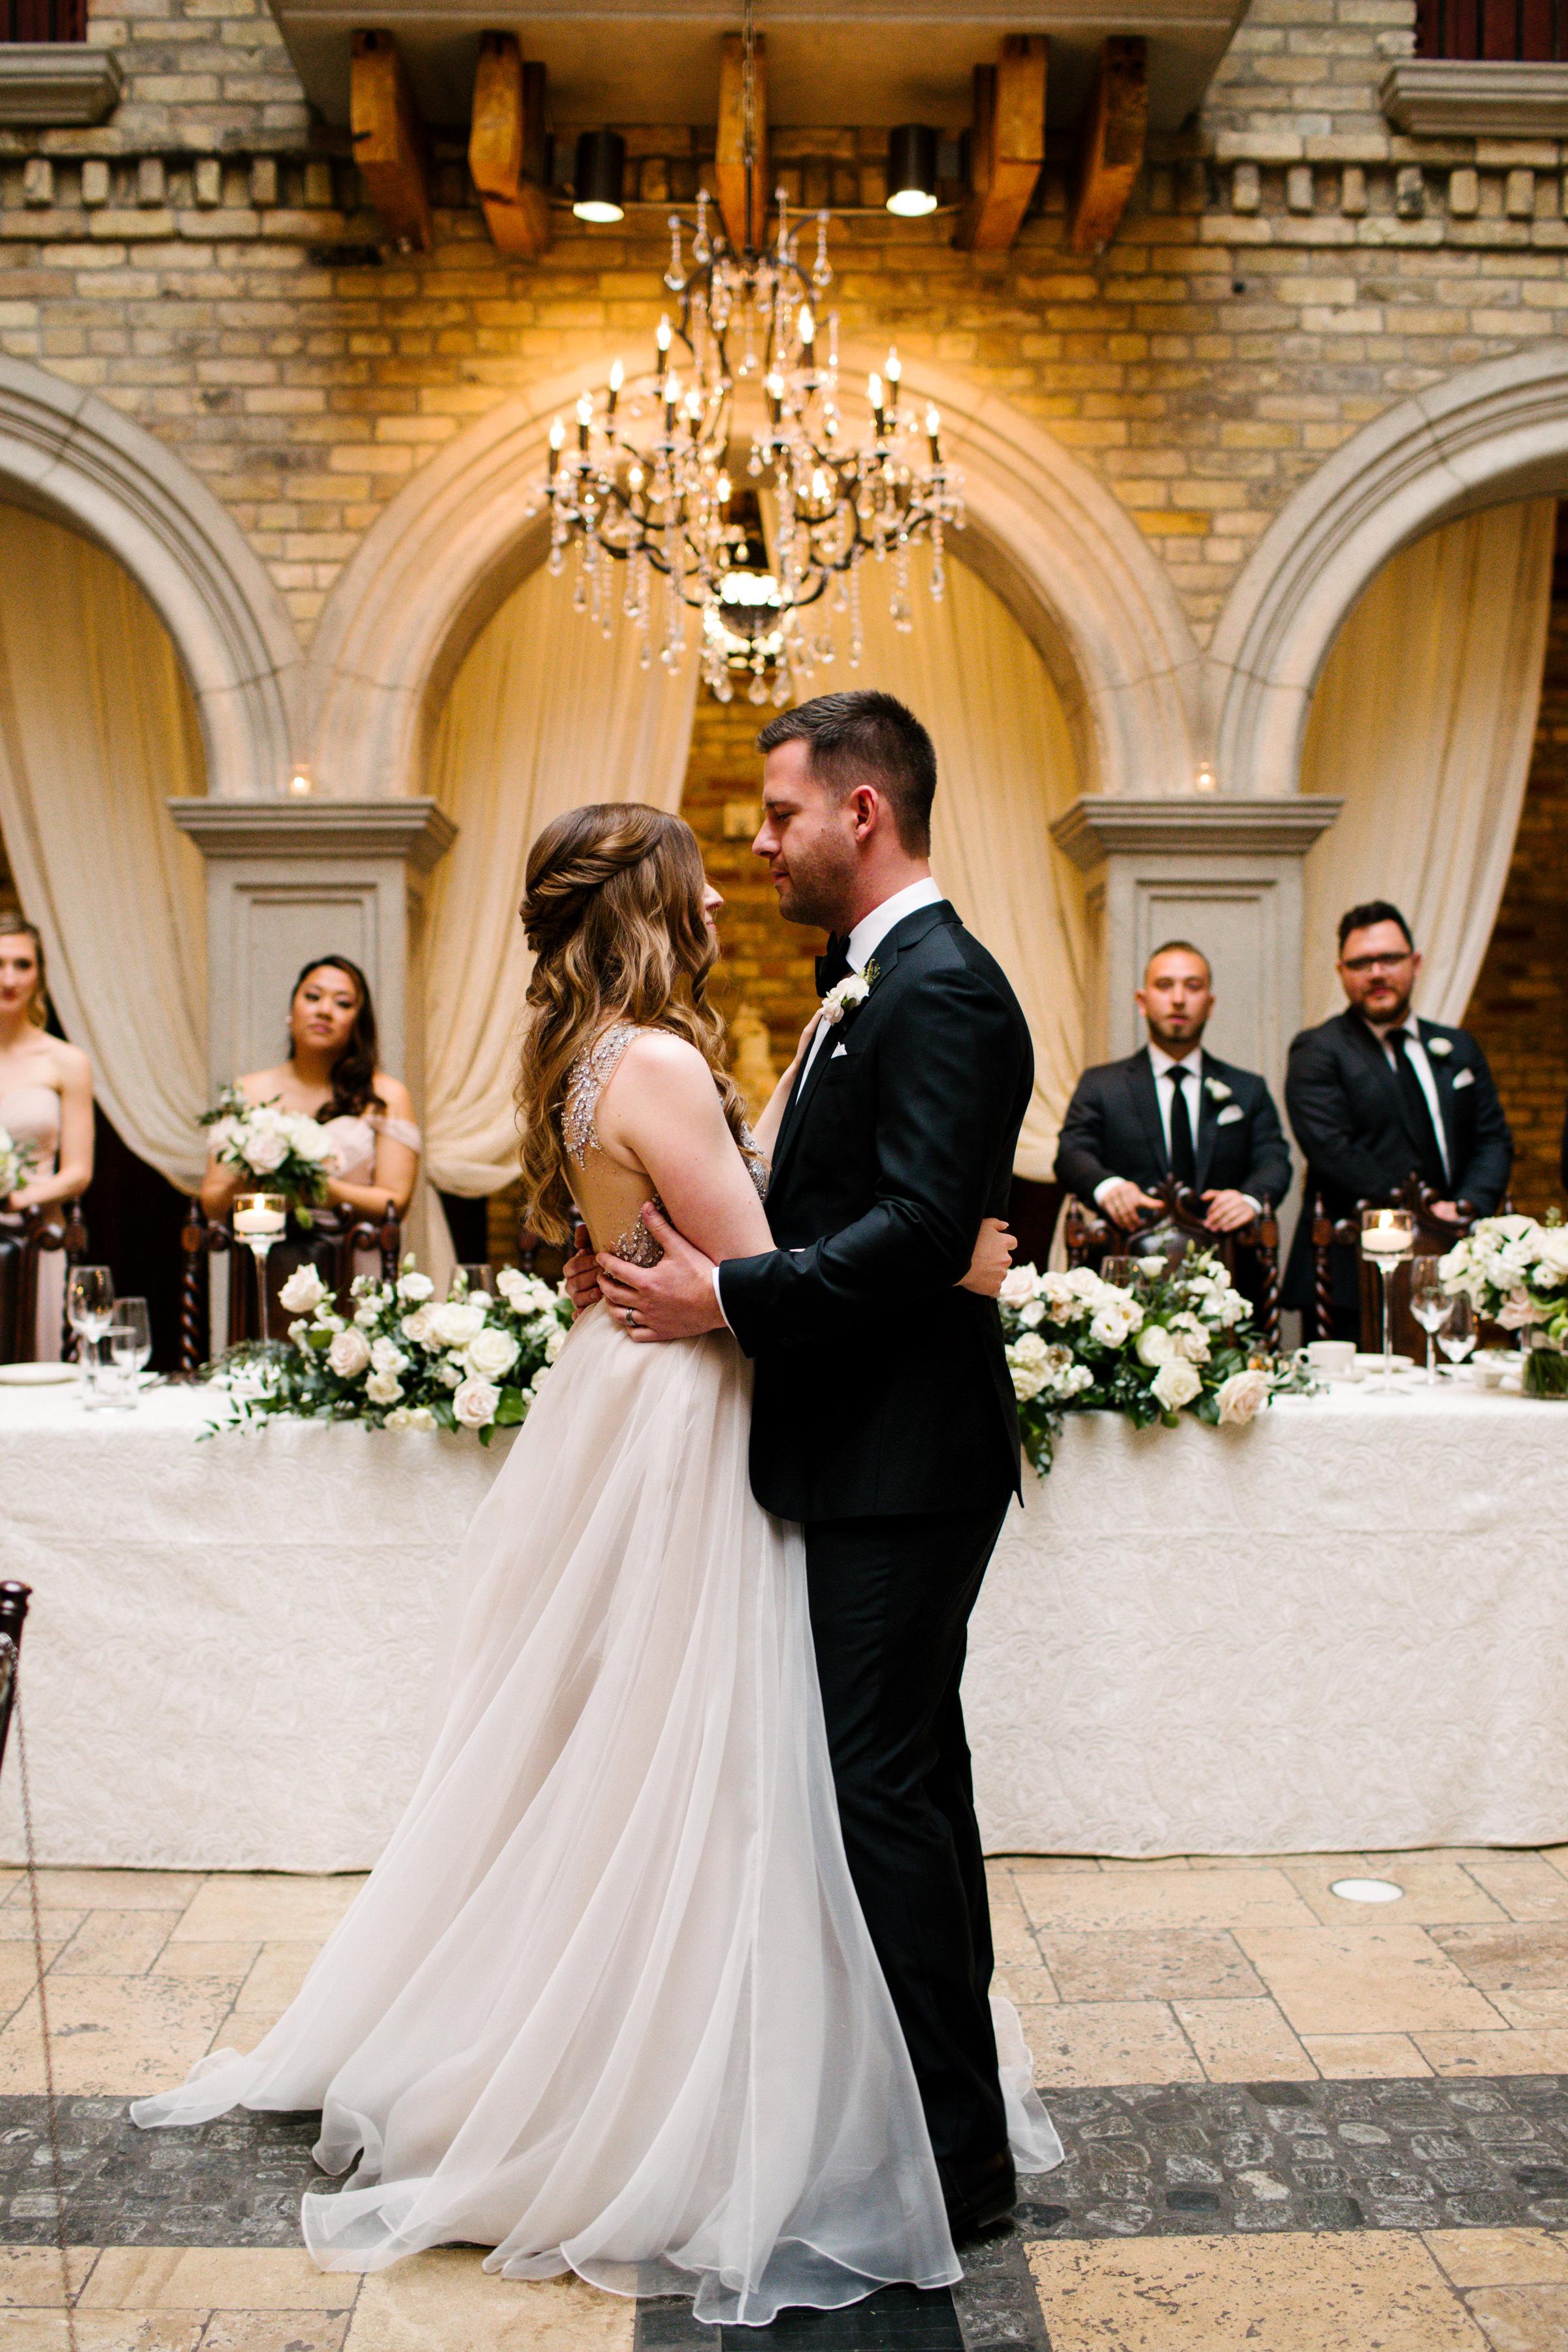 Wedding-519photographer- Eleanor Dobbins-instagram-eleanordobbins.jpg